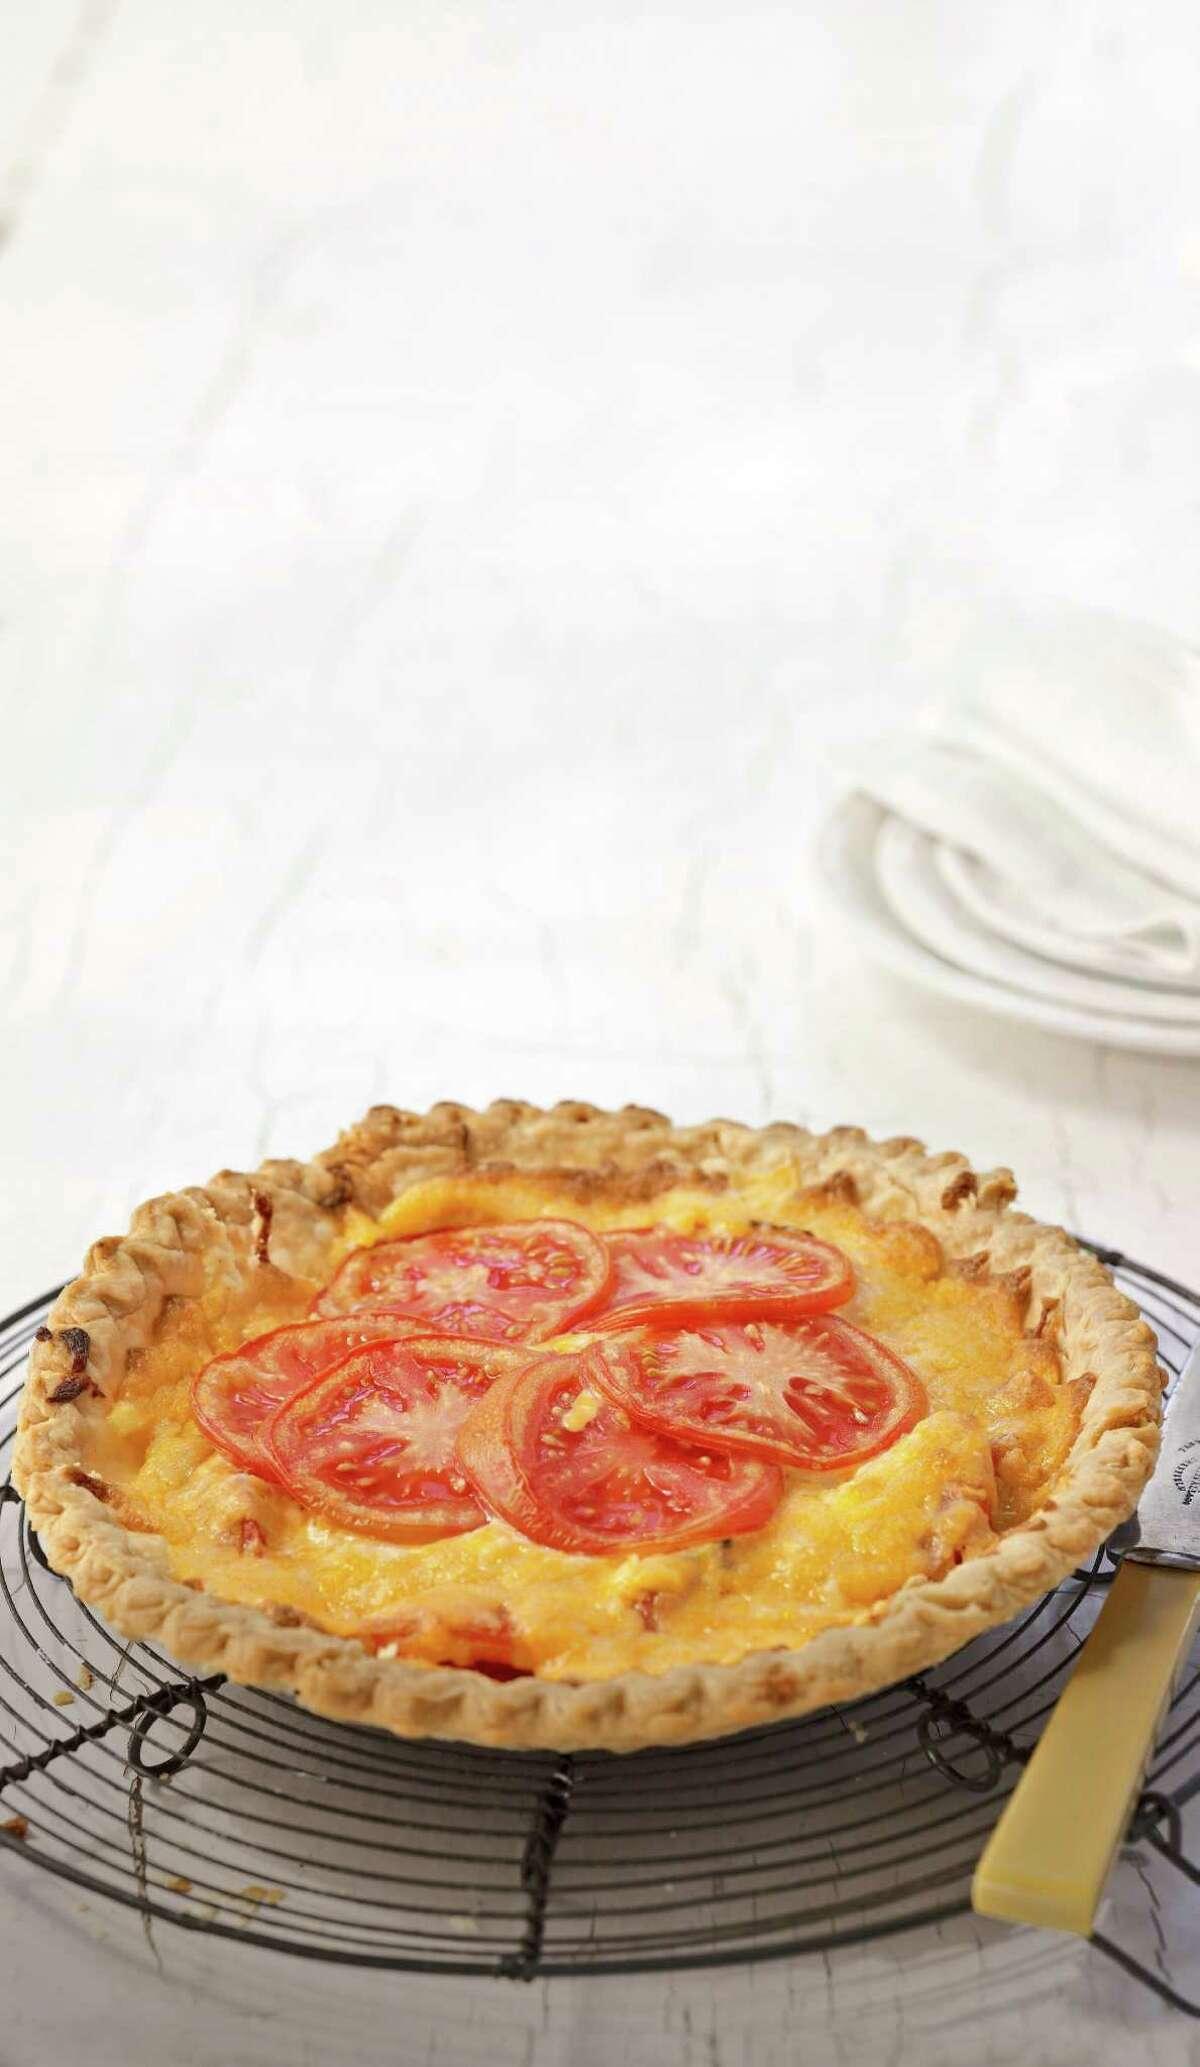 Country Living recipe for Tandi's Tomato Pie.